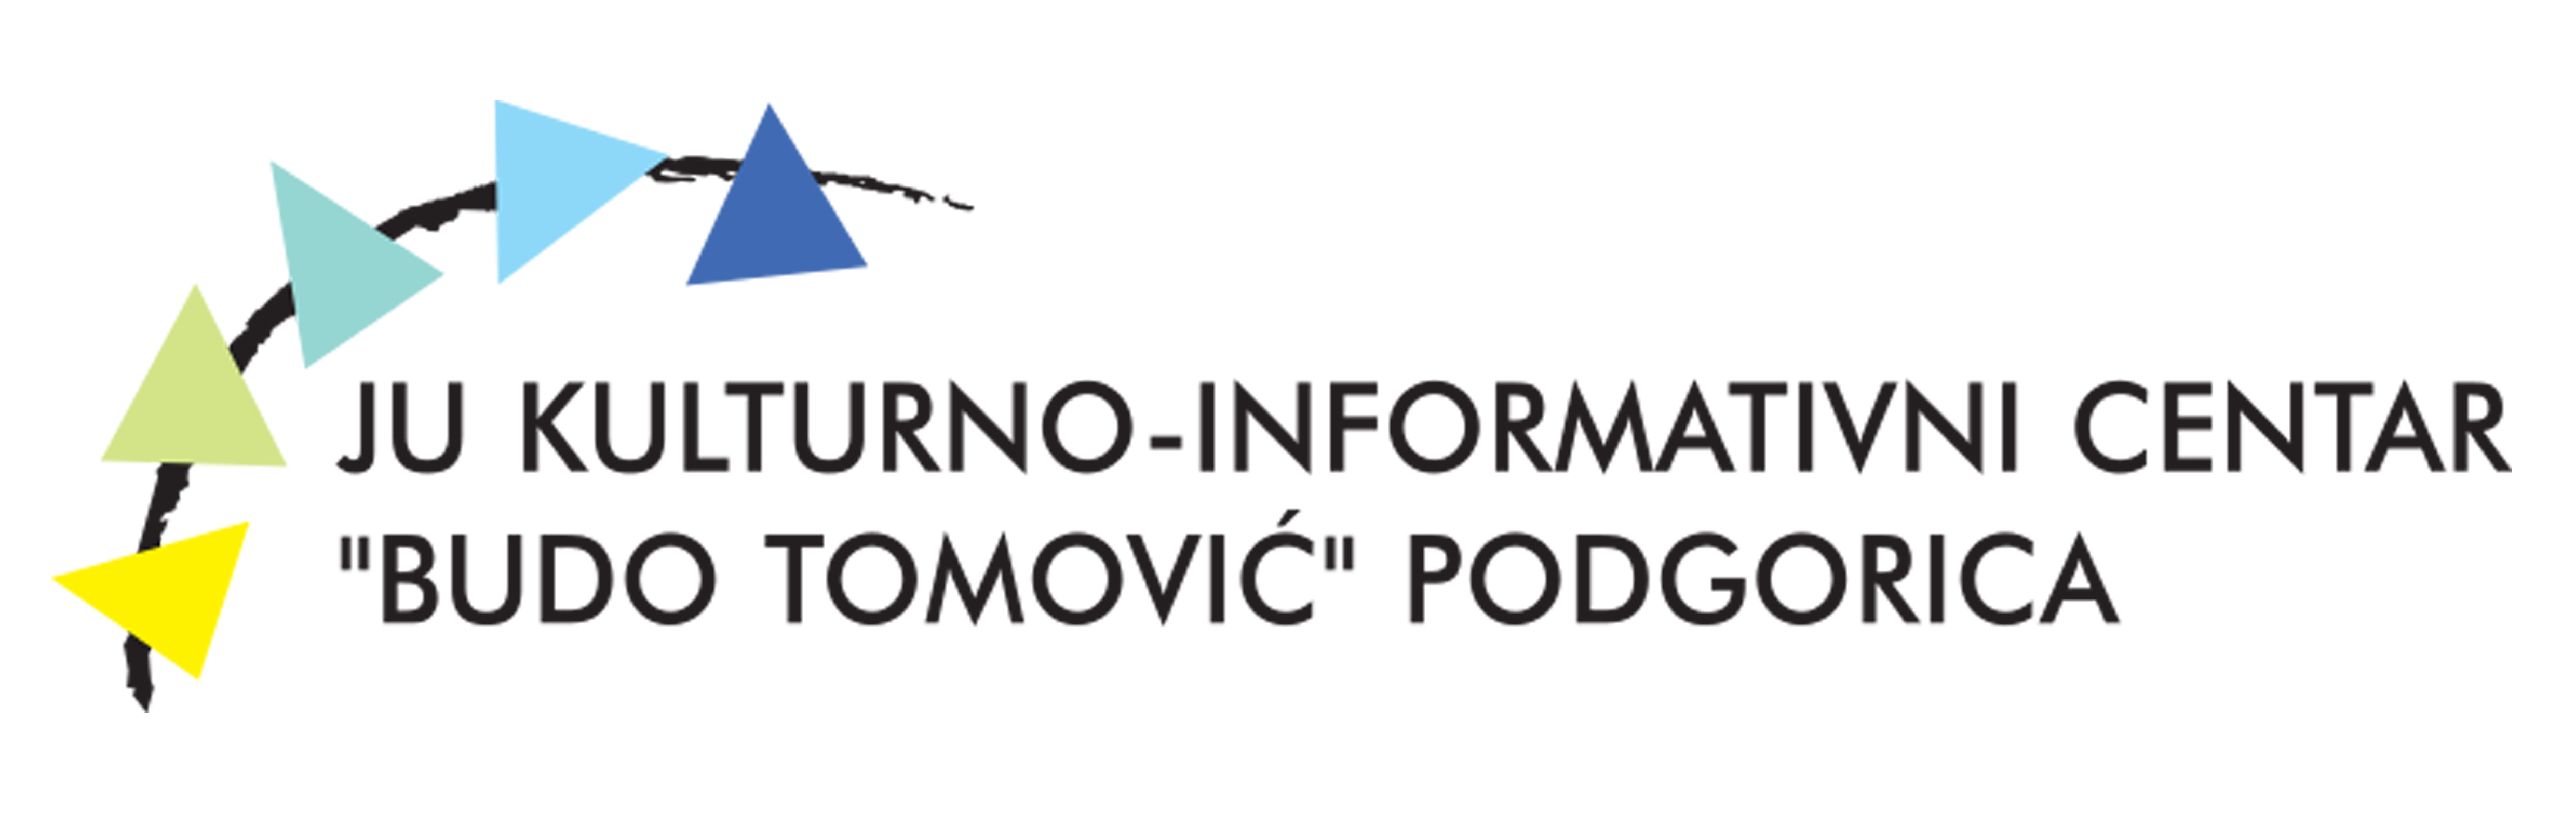 Kulturno Informativni Centar Podgorica